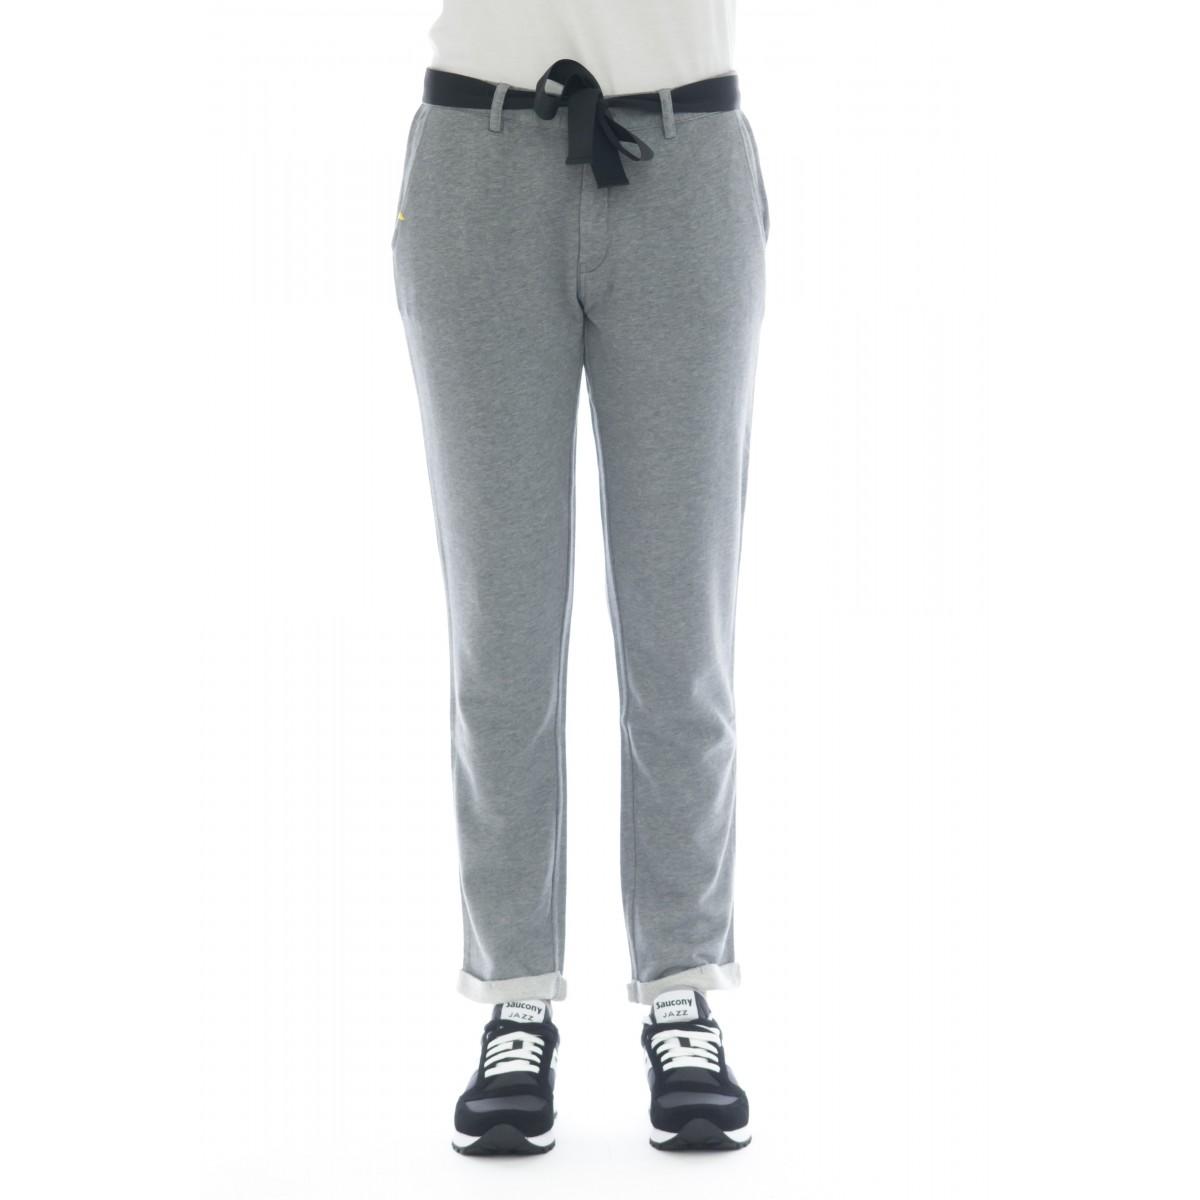 Pantalone donna - F40216 pantalone jogging